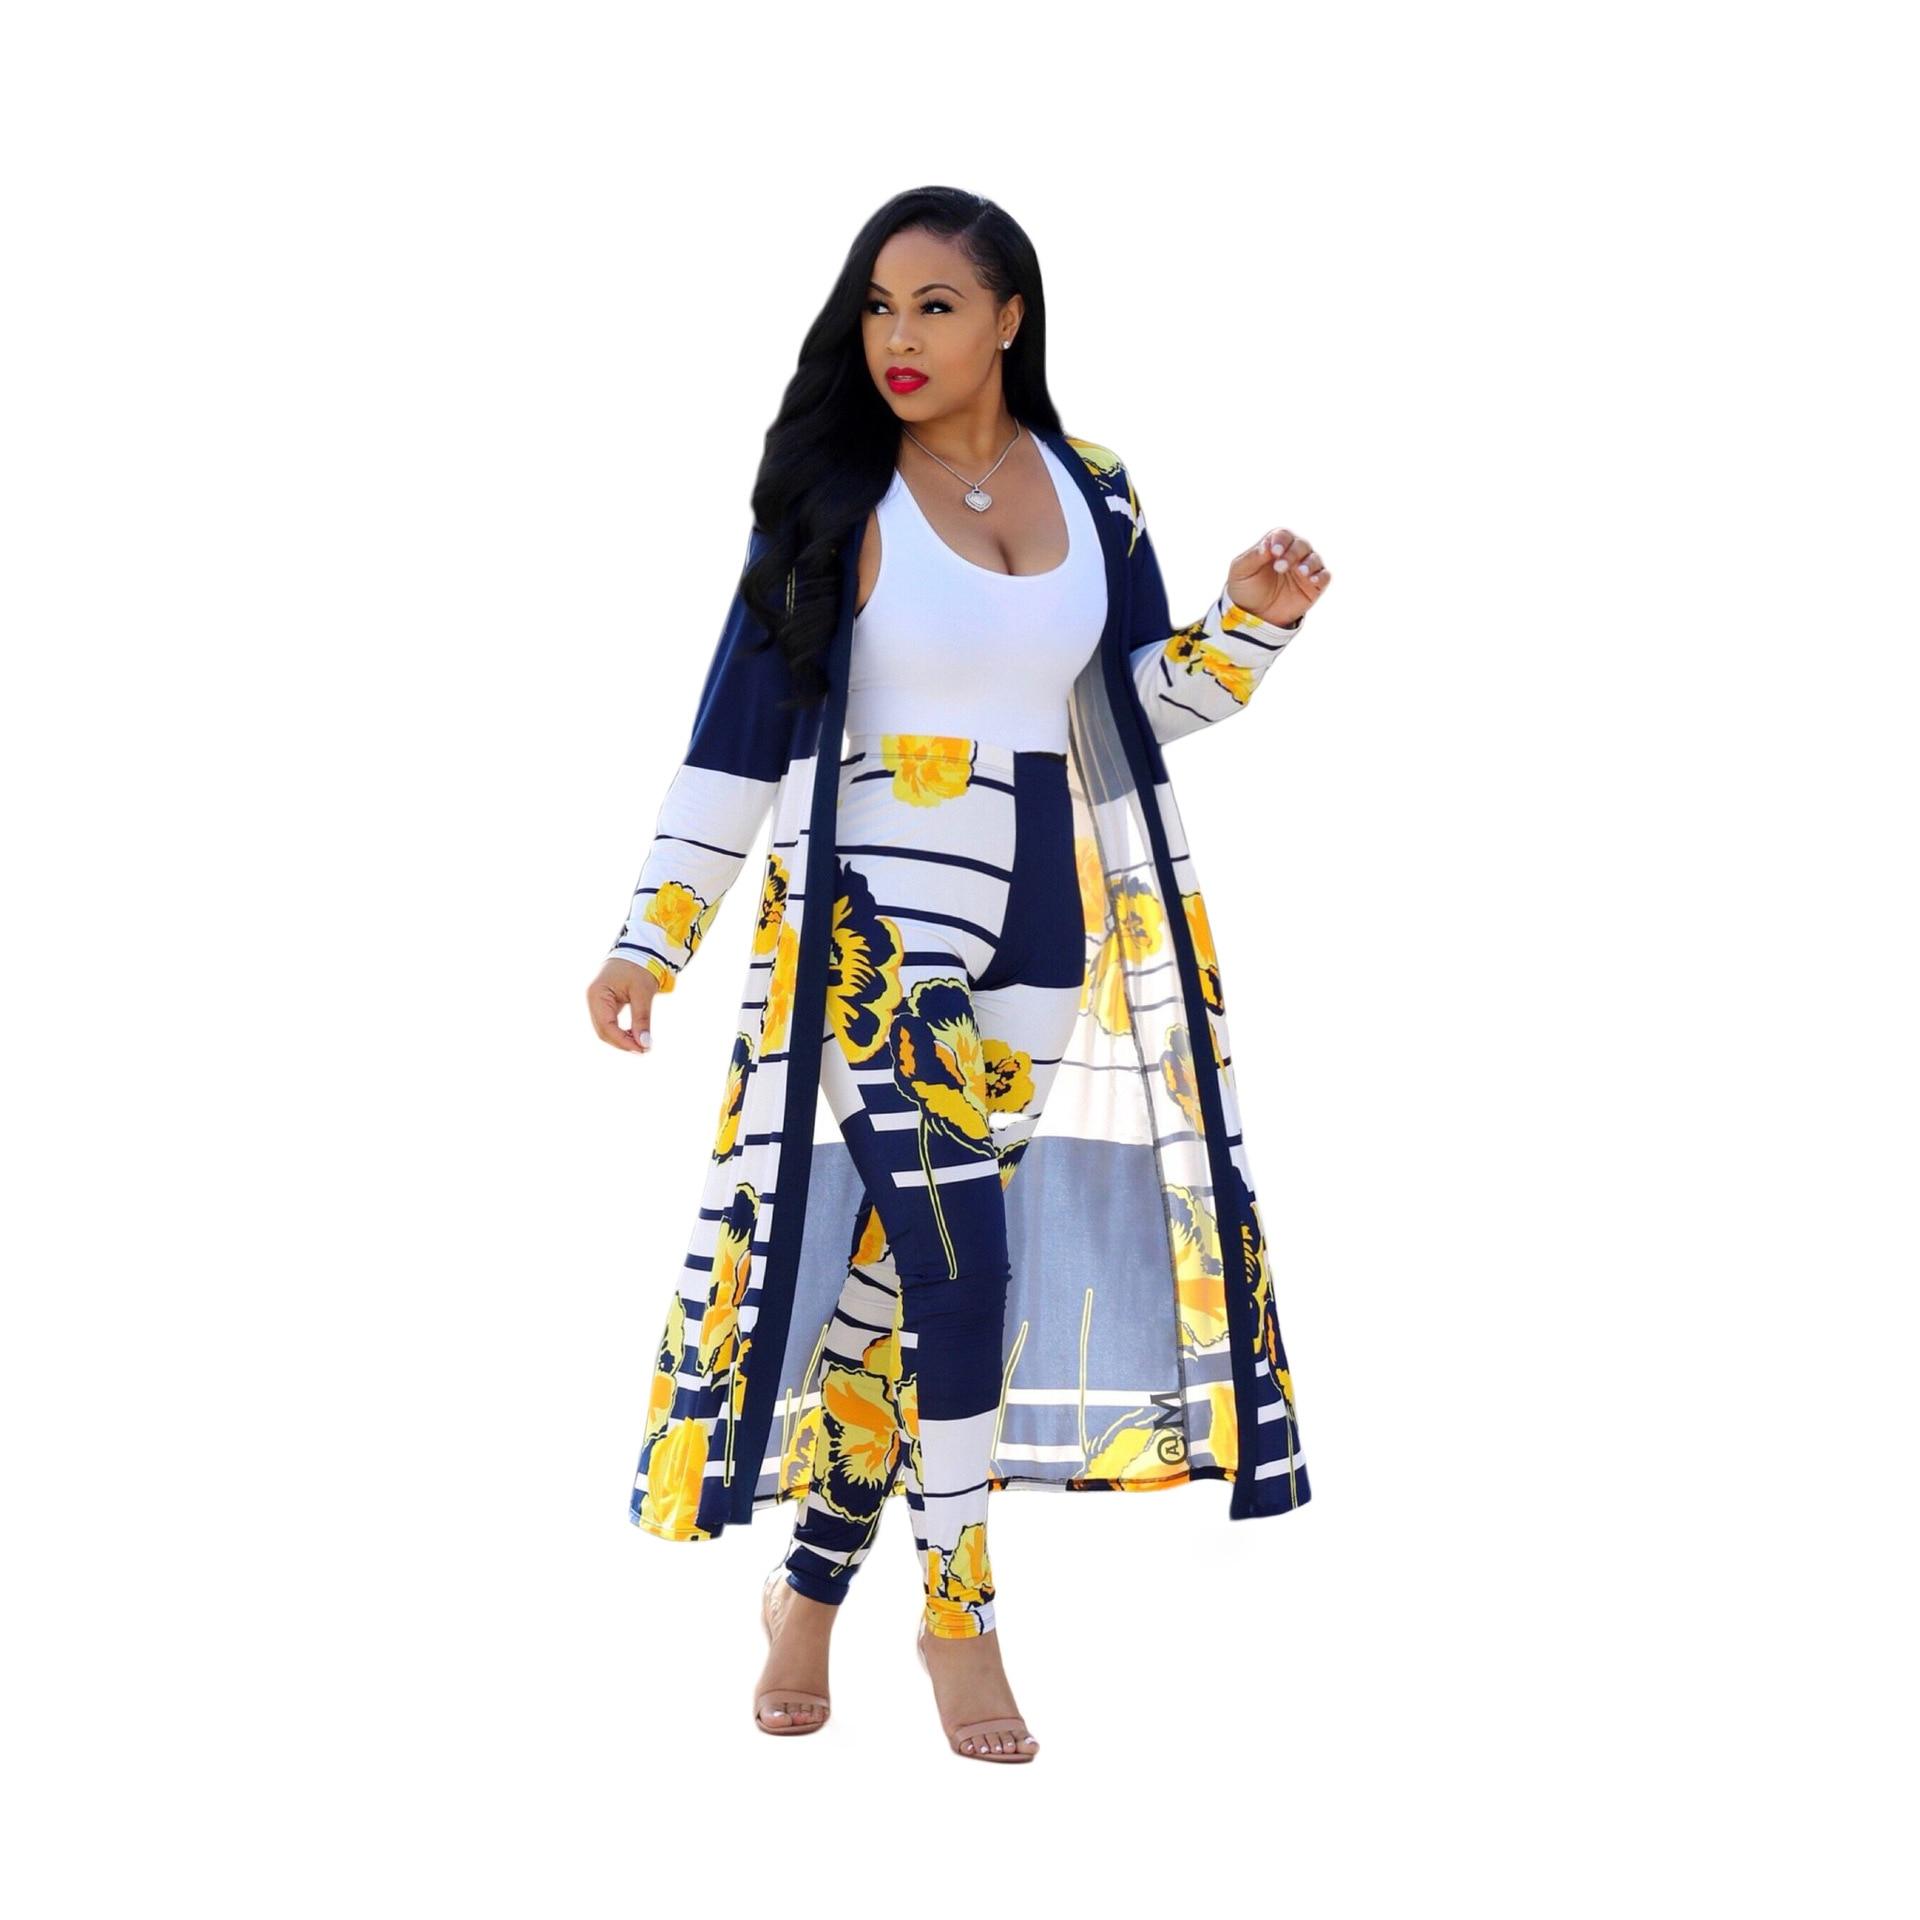 Women 2pcs Ponchos Autumn Patchwork Long Sleeve Overcoat Female Yellow Blue Loose Capes Women Open Stitc Suit and long pants Set